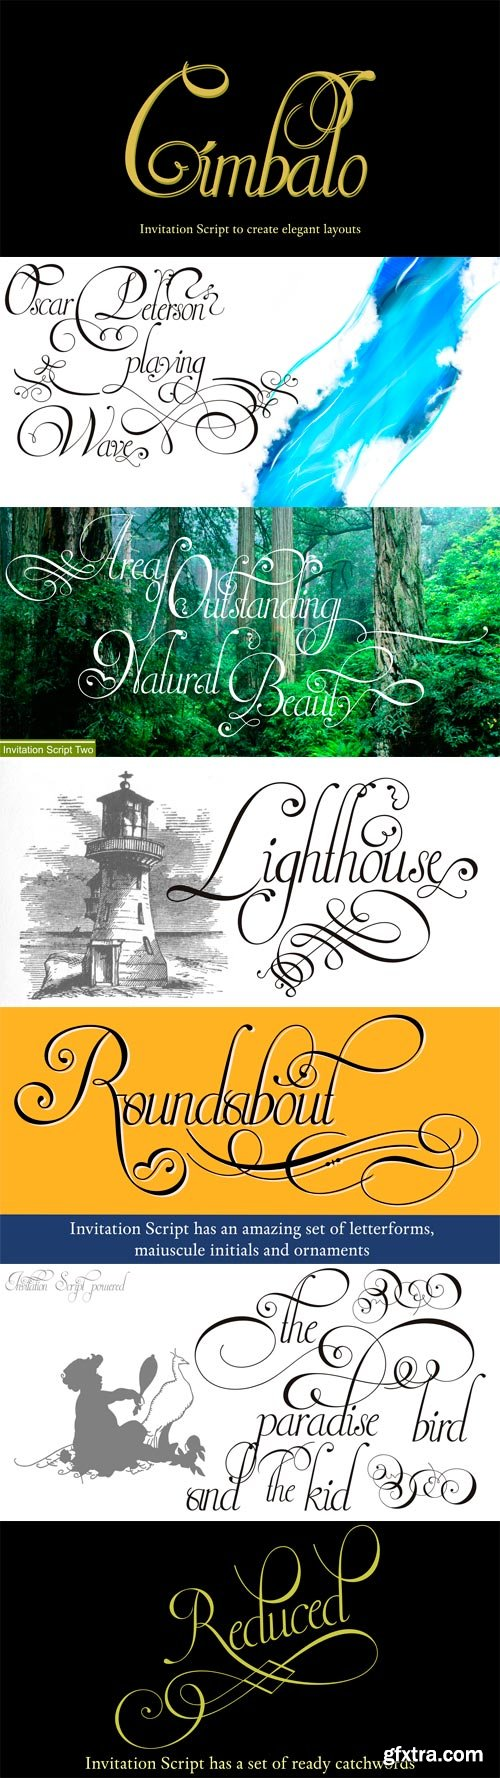 Invitation Script Font Family - 4 Fonts for $132